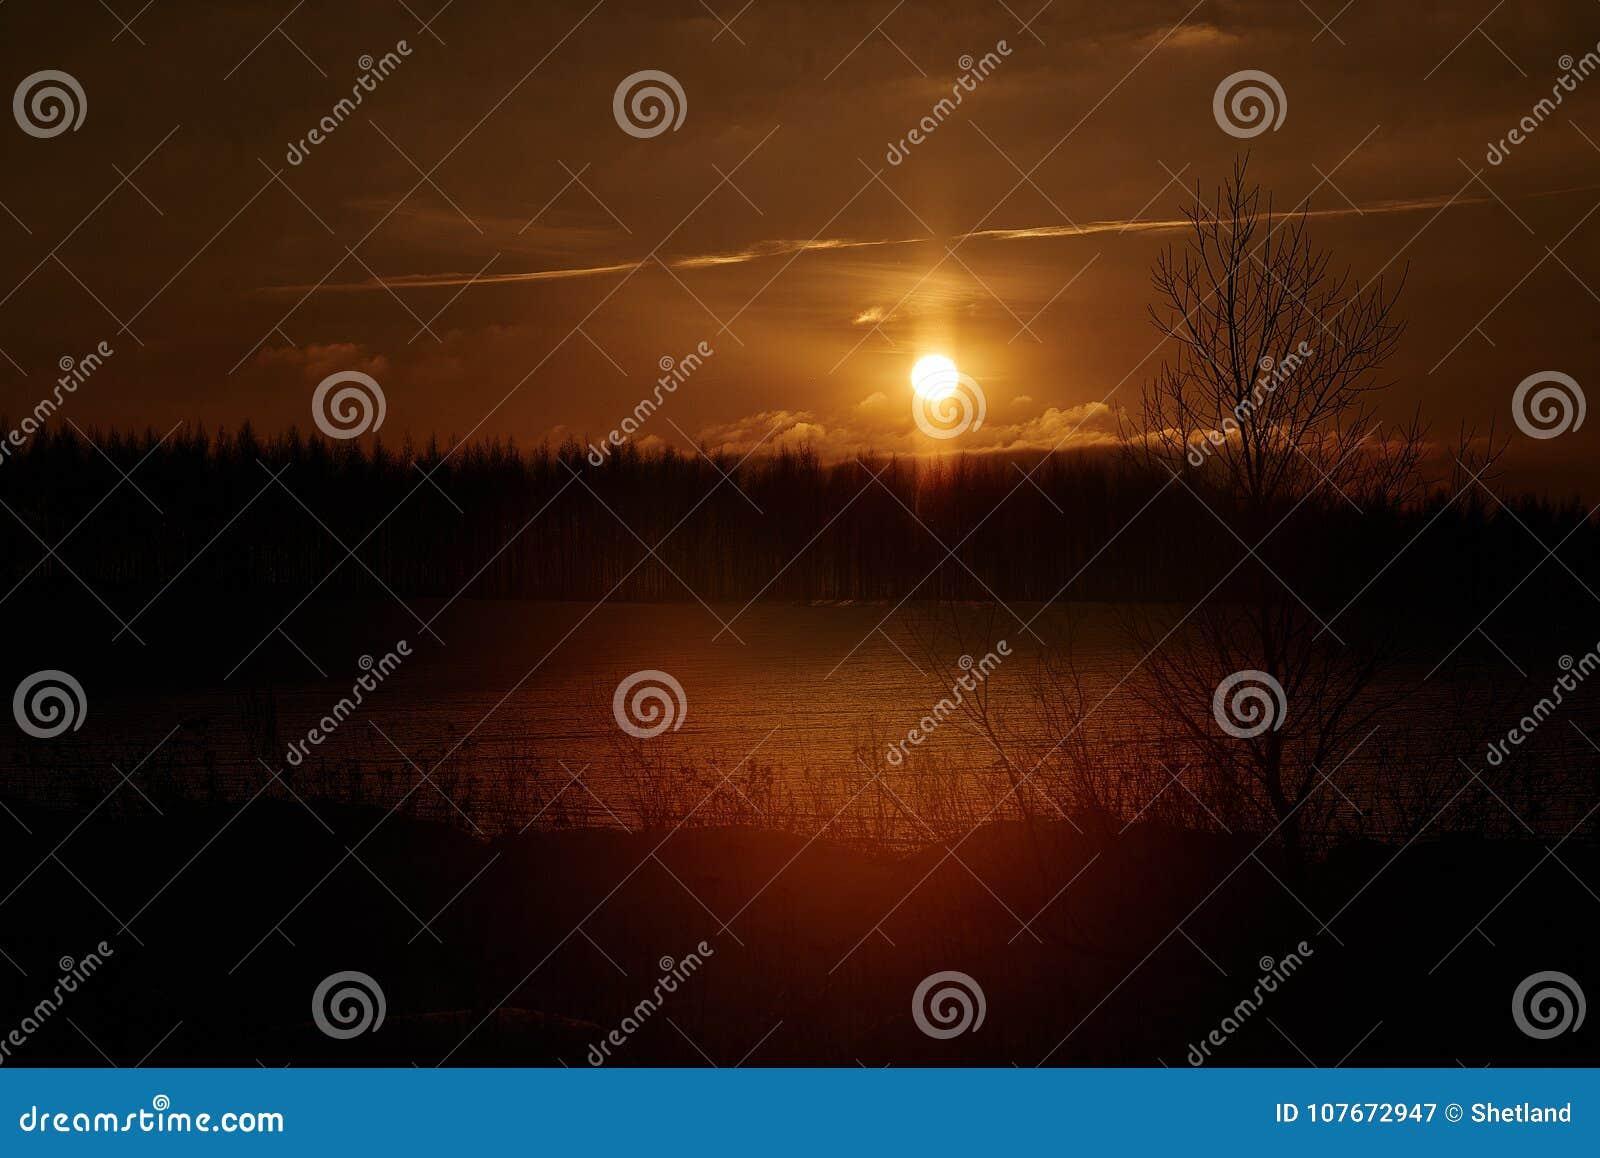 Fog, evening, dawn, tree, silhouette, river, night, light, dusk